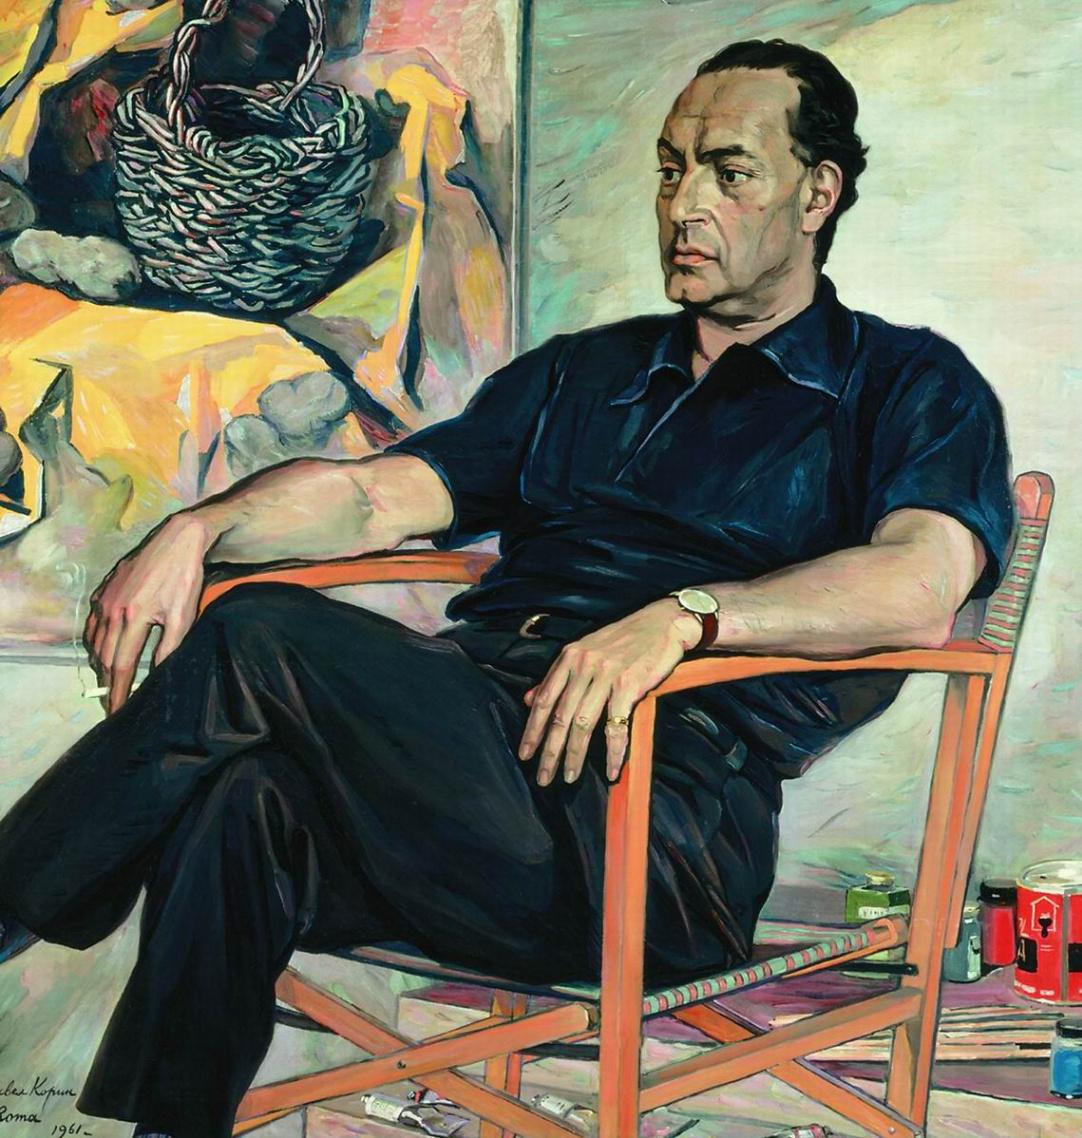 Pavel Dmitrievich Korin Russia 1892 - 1967. Portrait of Renato Guttuso. State Russian Museum, St. Petersburg